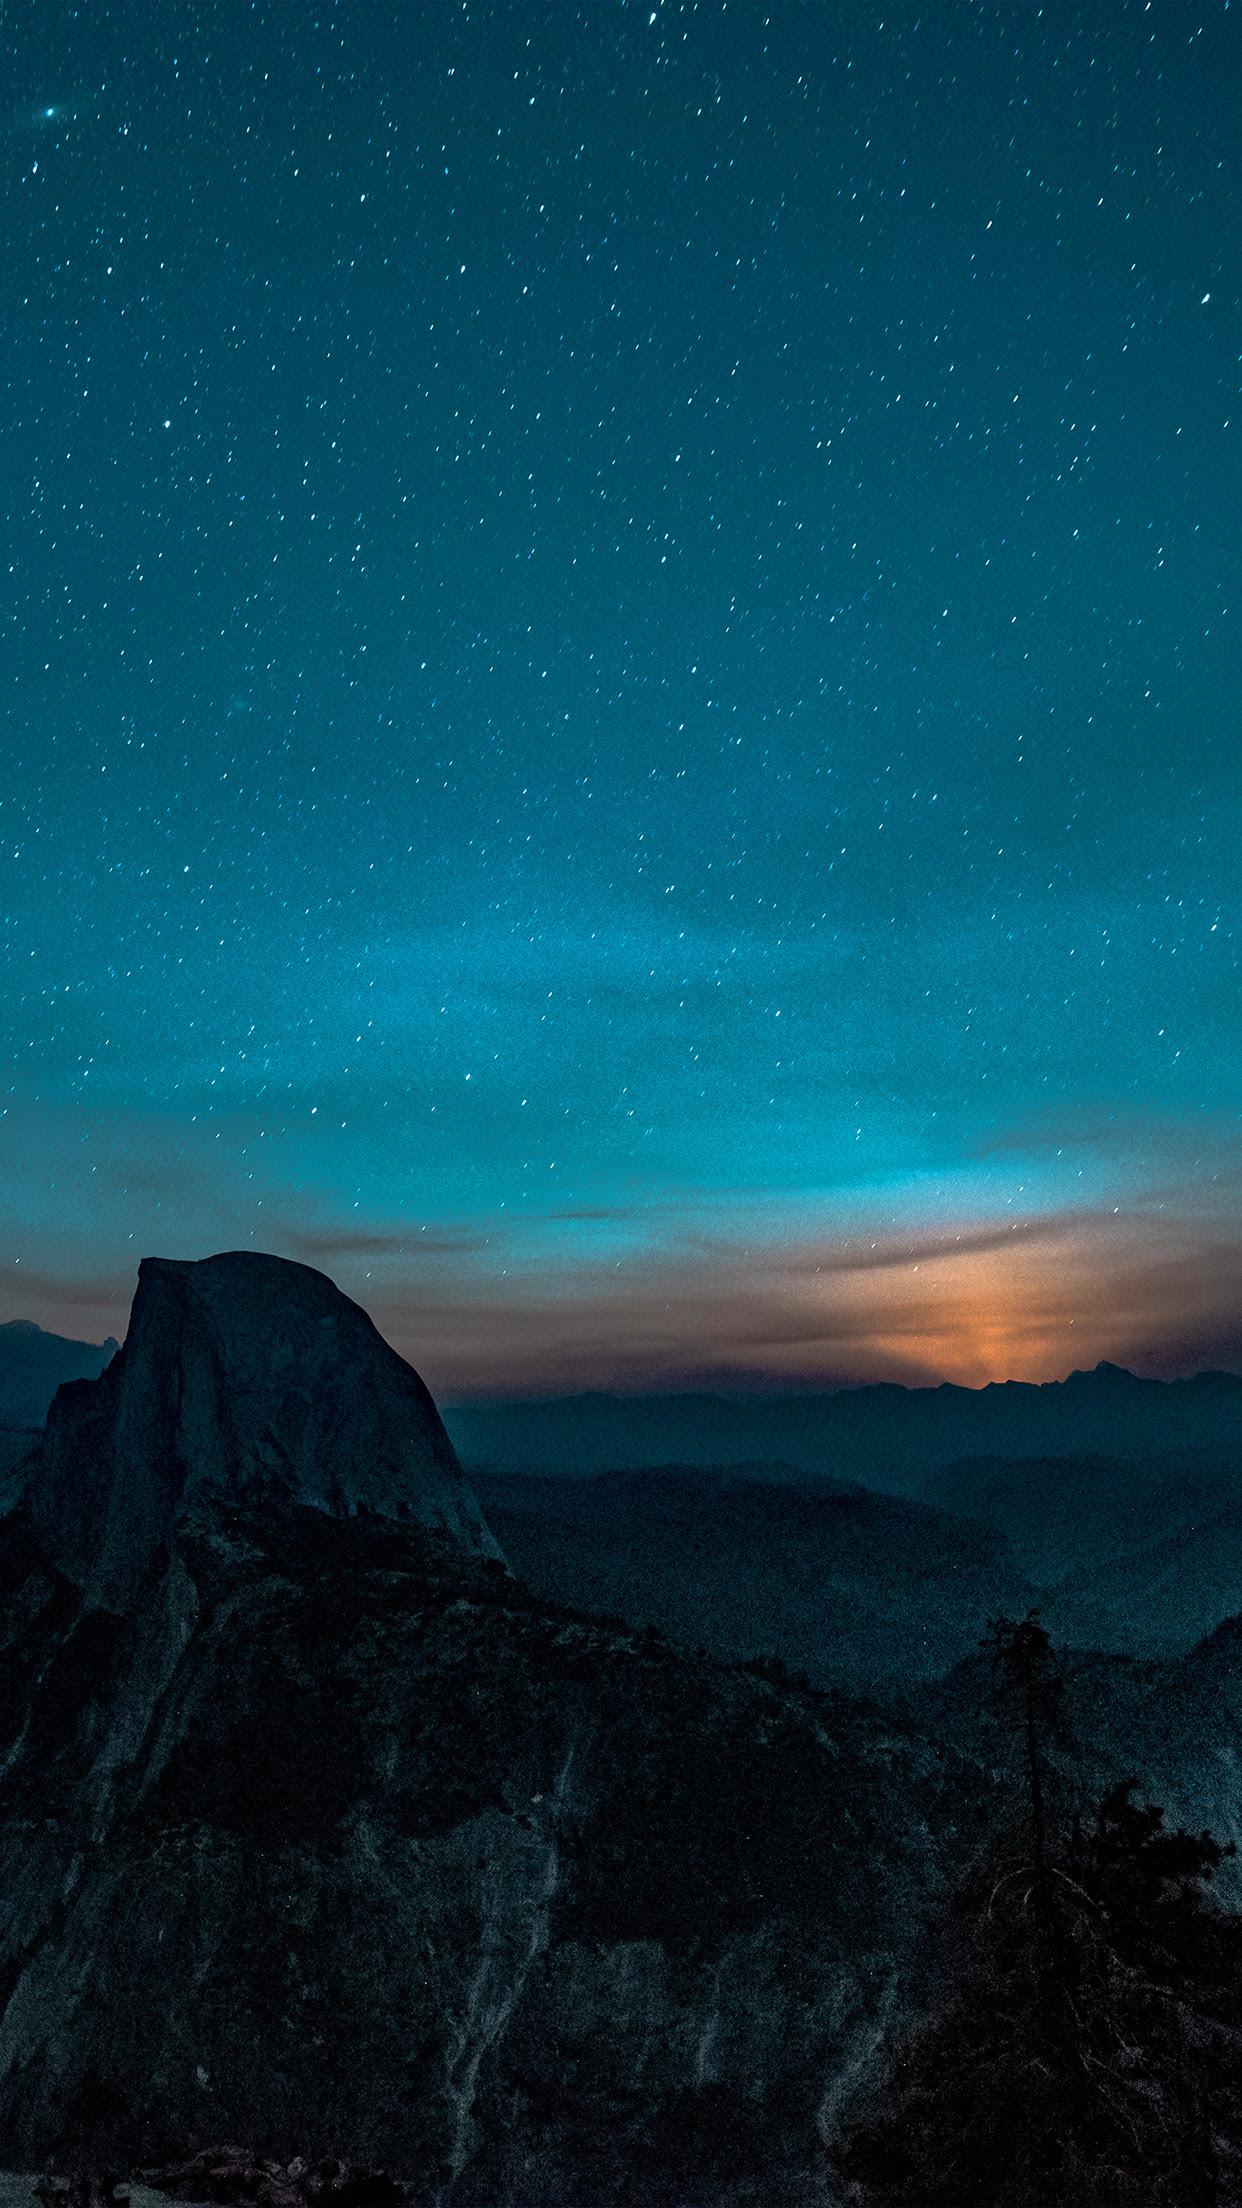 Mountains Night Hd Iphone Wallpaper